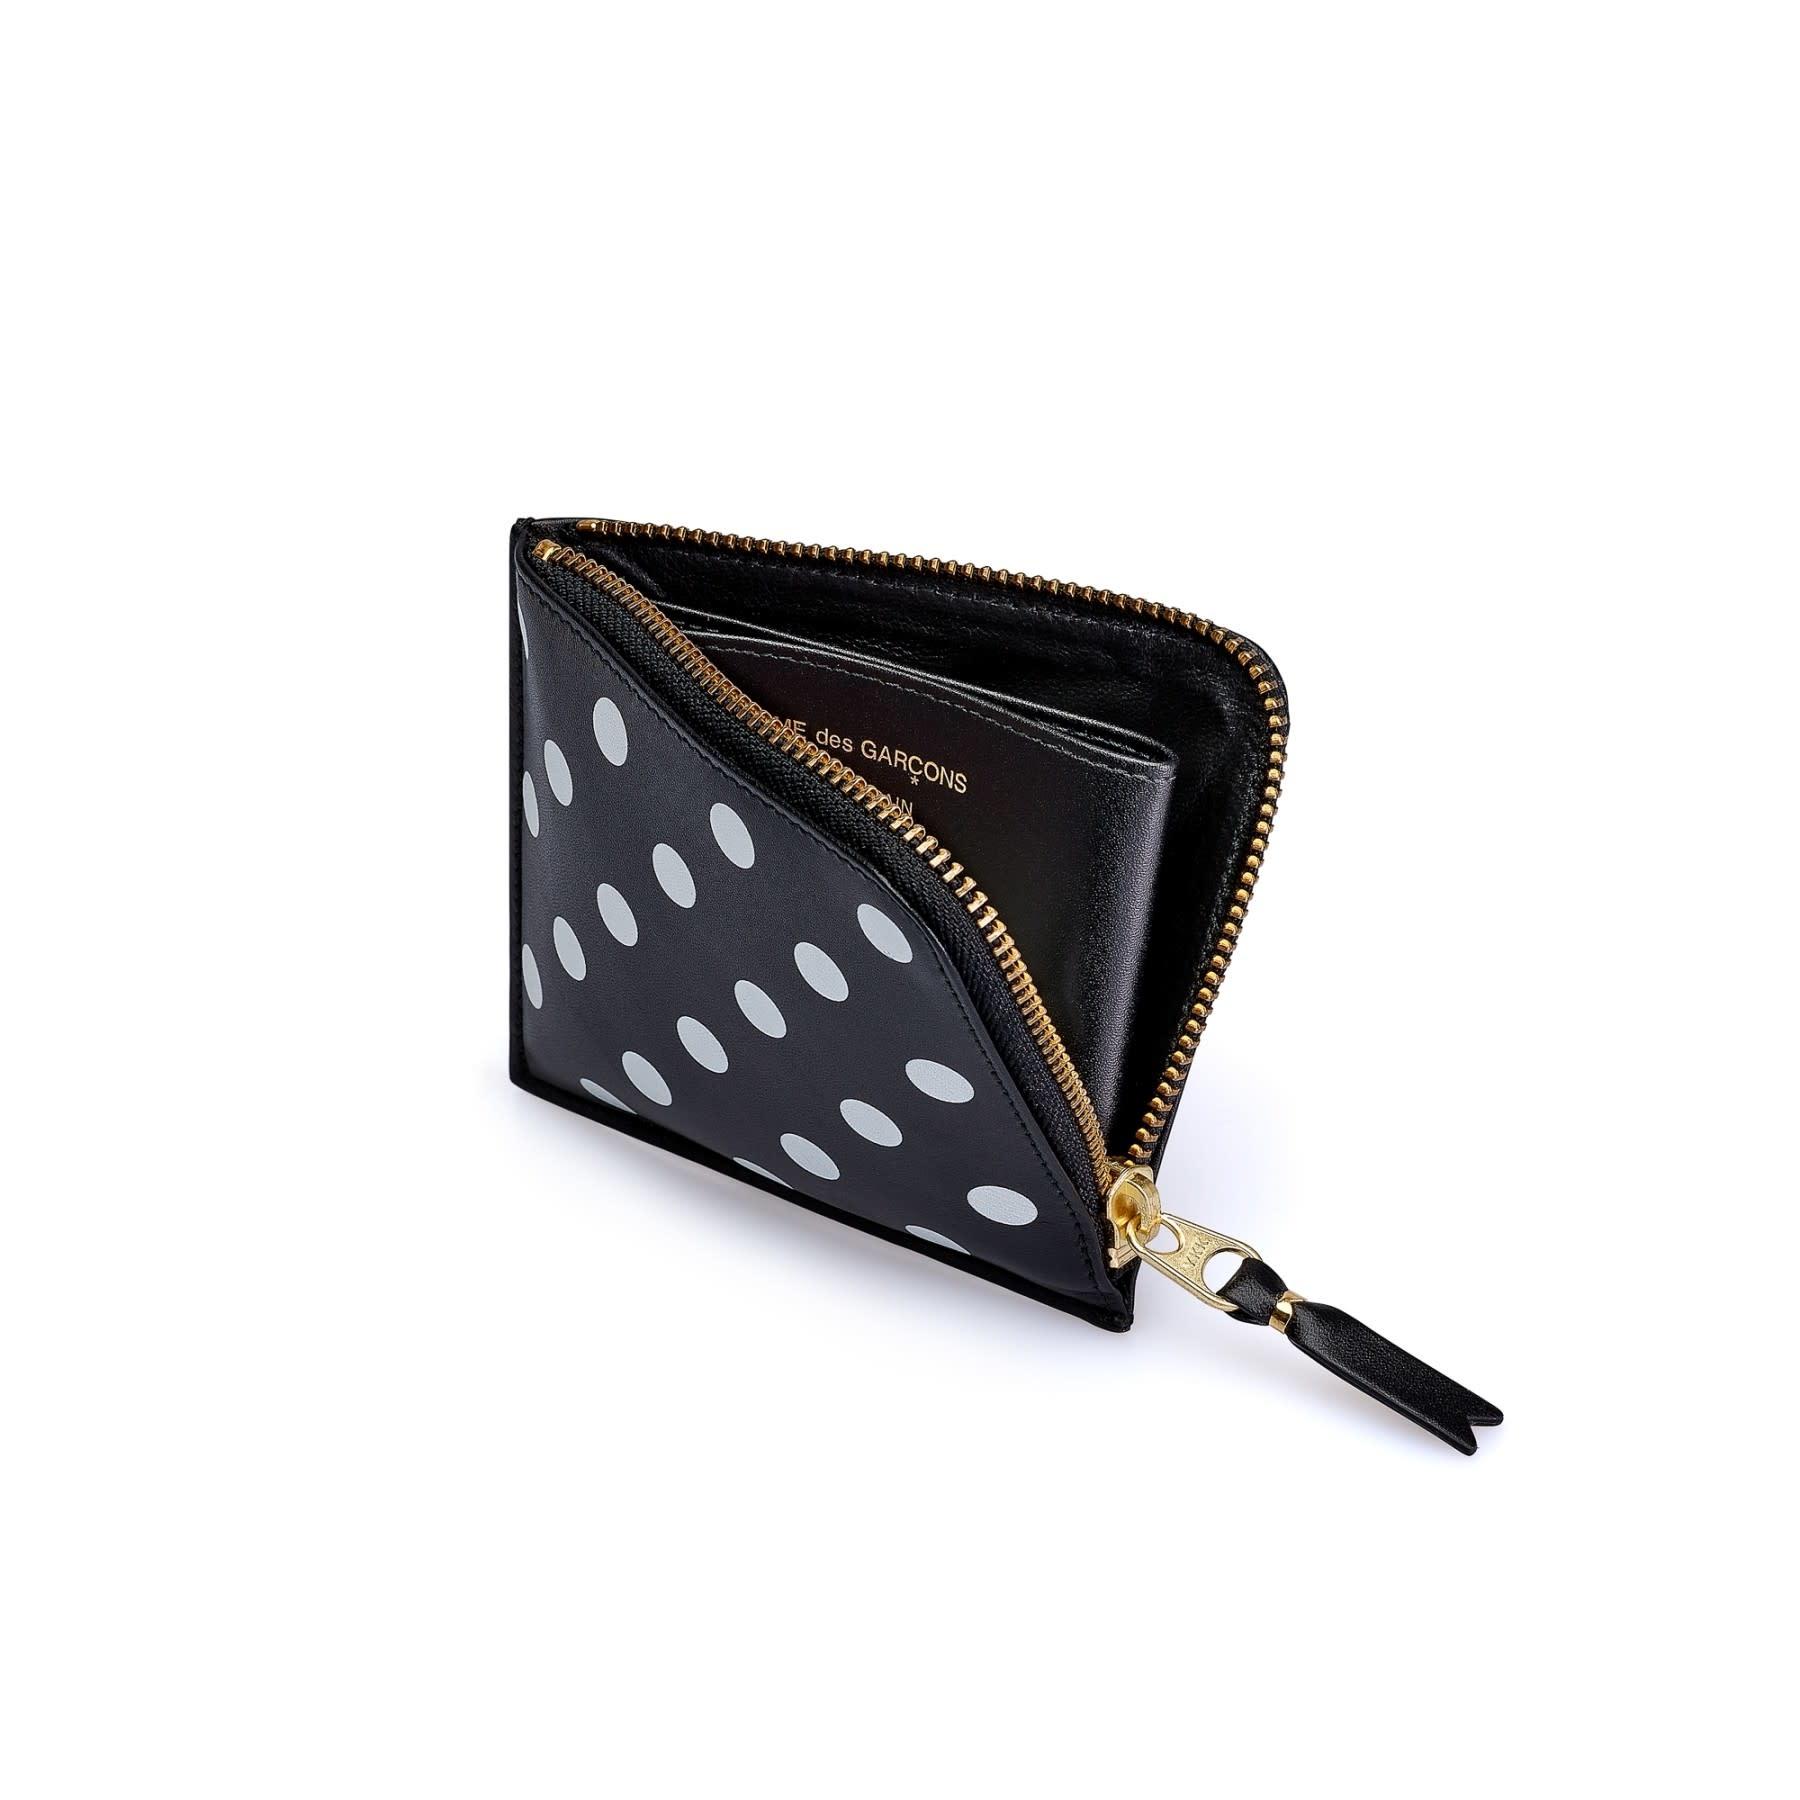 COMME des GARÇONS Wallet Comme des Garçons 1/2 Zip Wallet in Polka Dot SA3100PD